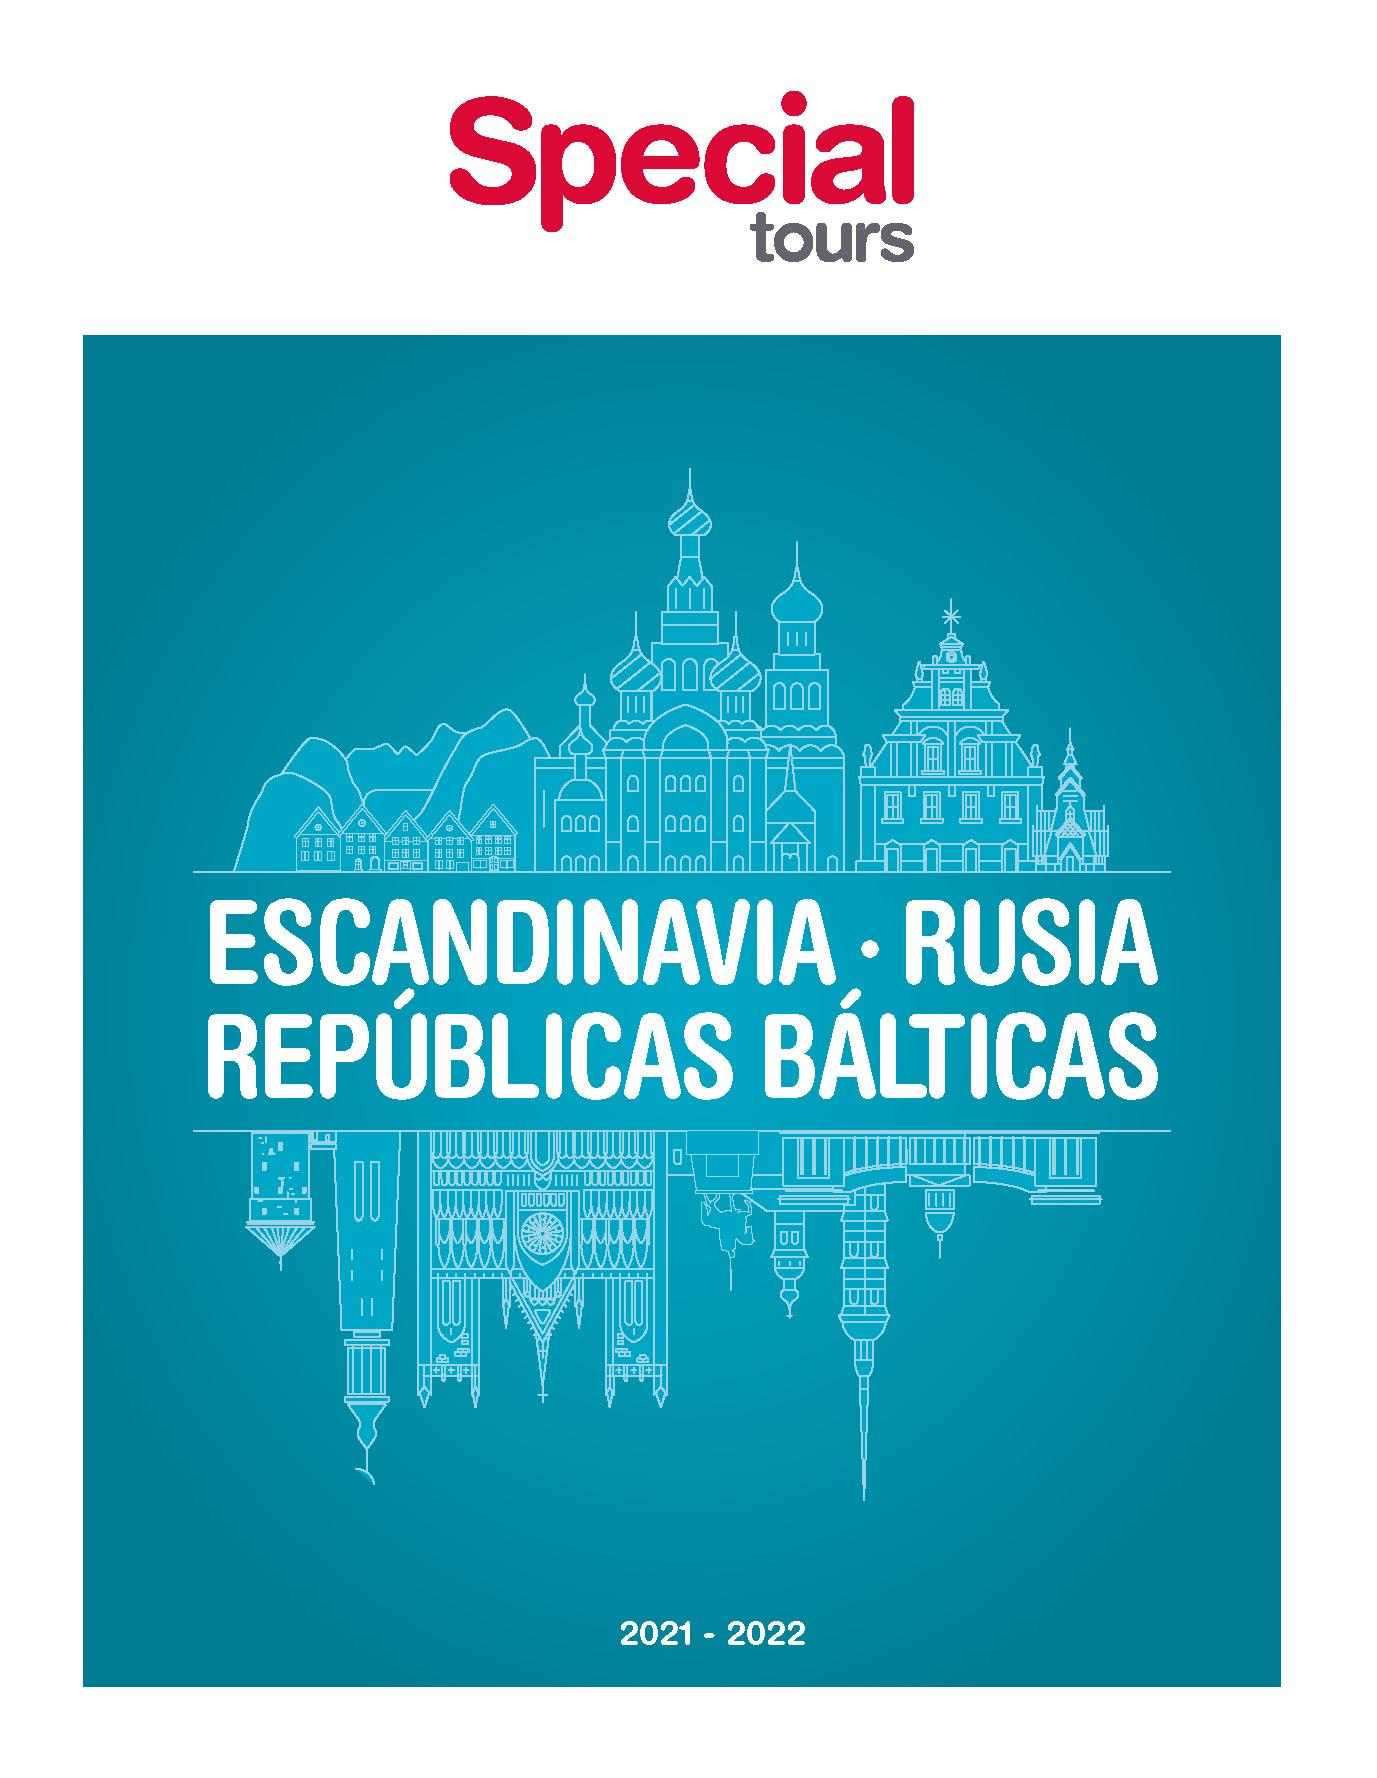 Catalogo Special Tours Escandinavia Rusia y Balticos 2021-2022